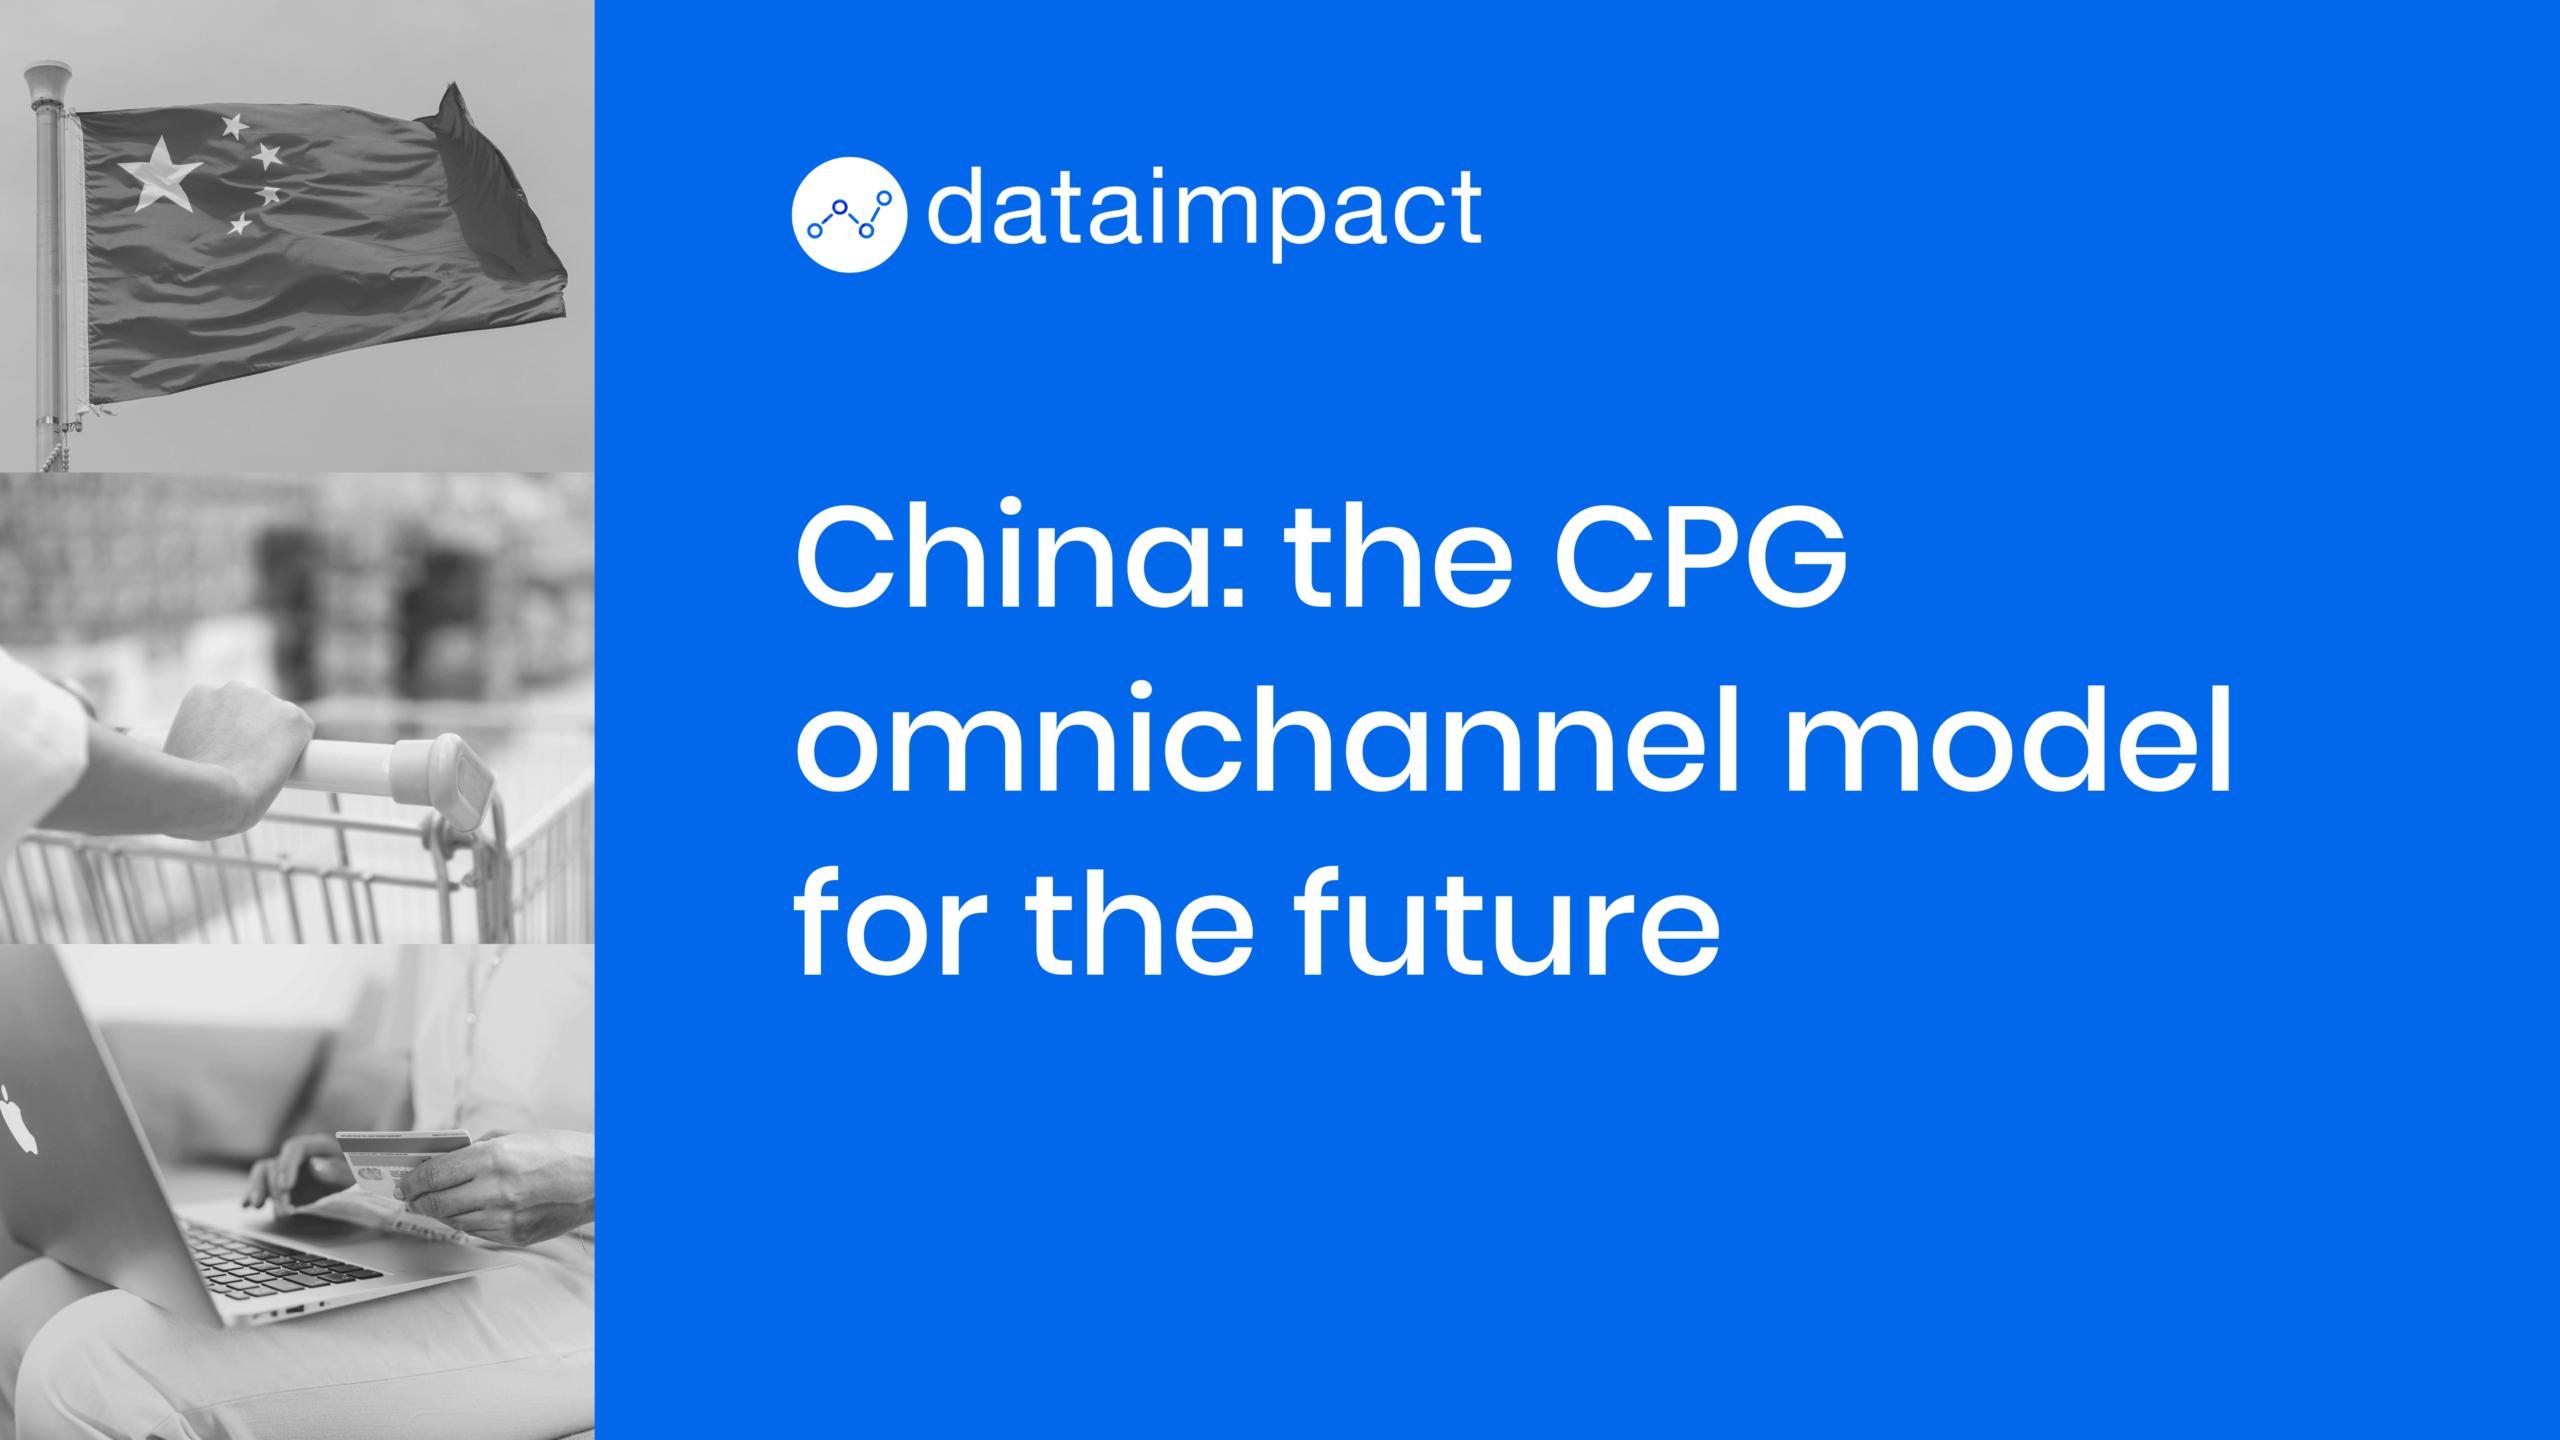 china omnichannel model CPG